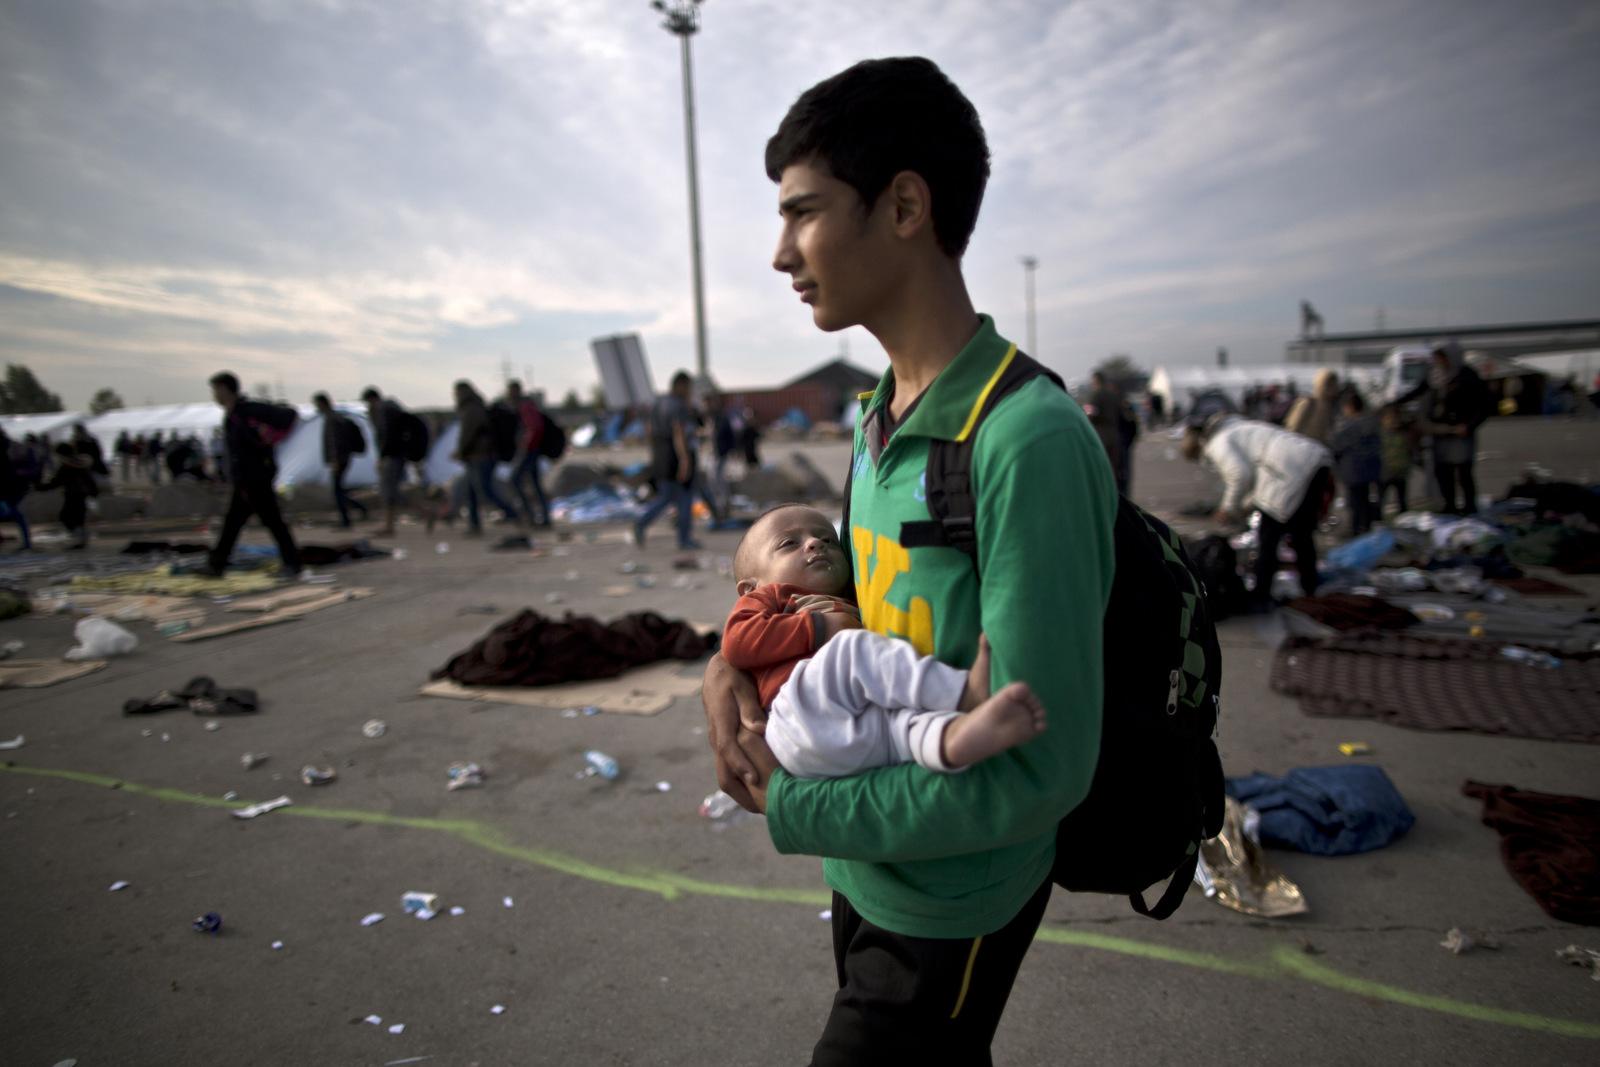 Afghan refugee Rasoul Nazari, 15, holds his 10-month-old nephew Imran after crossing the border between Hungary and Austria in Nickelsdorf, Austria. (AP Photo/Muhammed Muheisen)